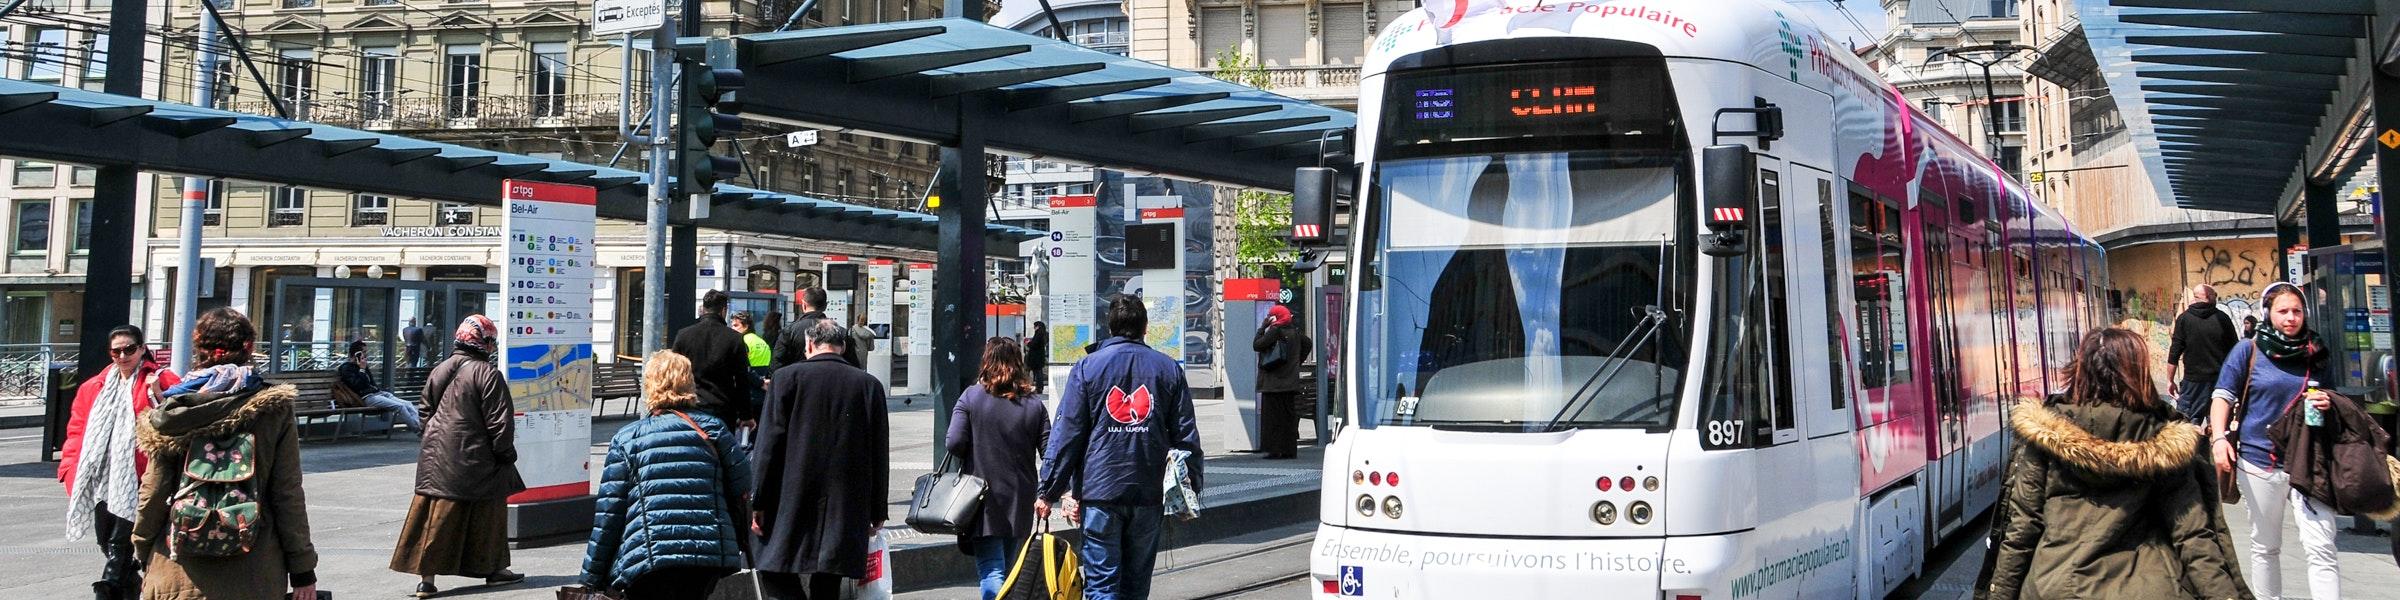 Geneva tram stop Place de Bel Air